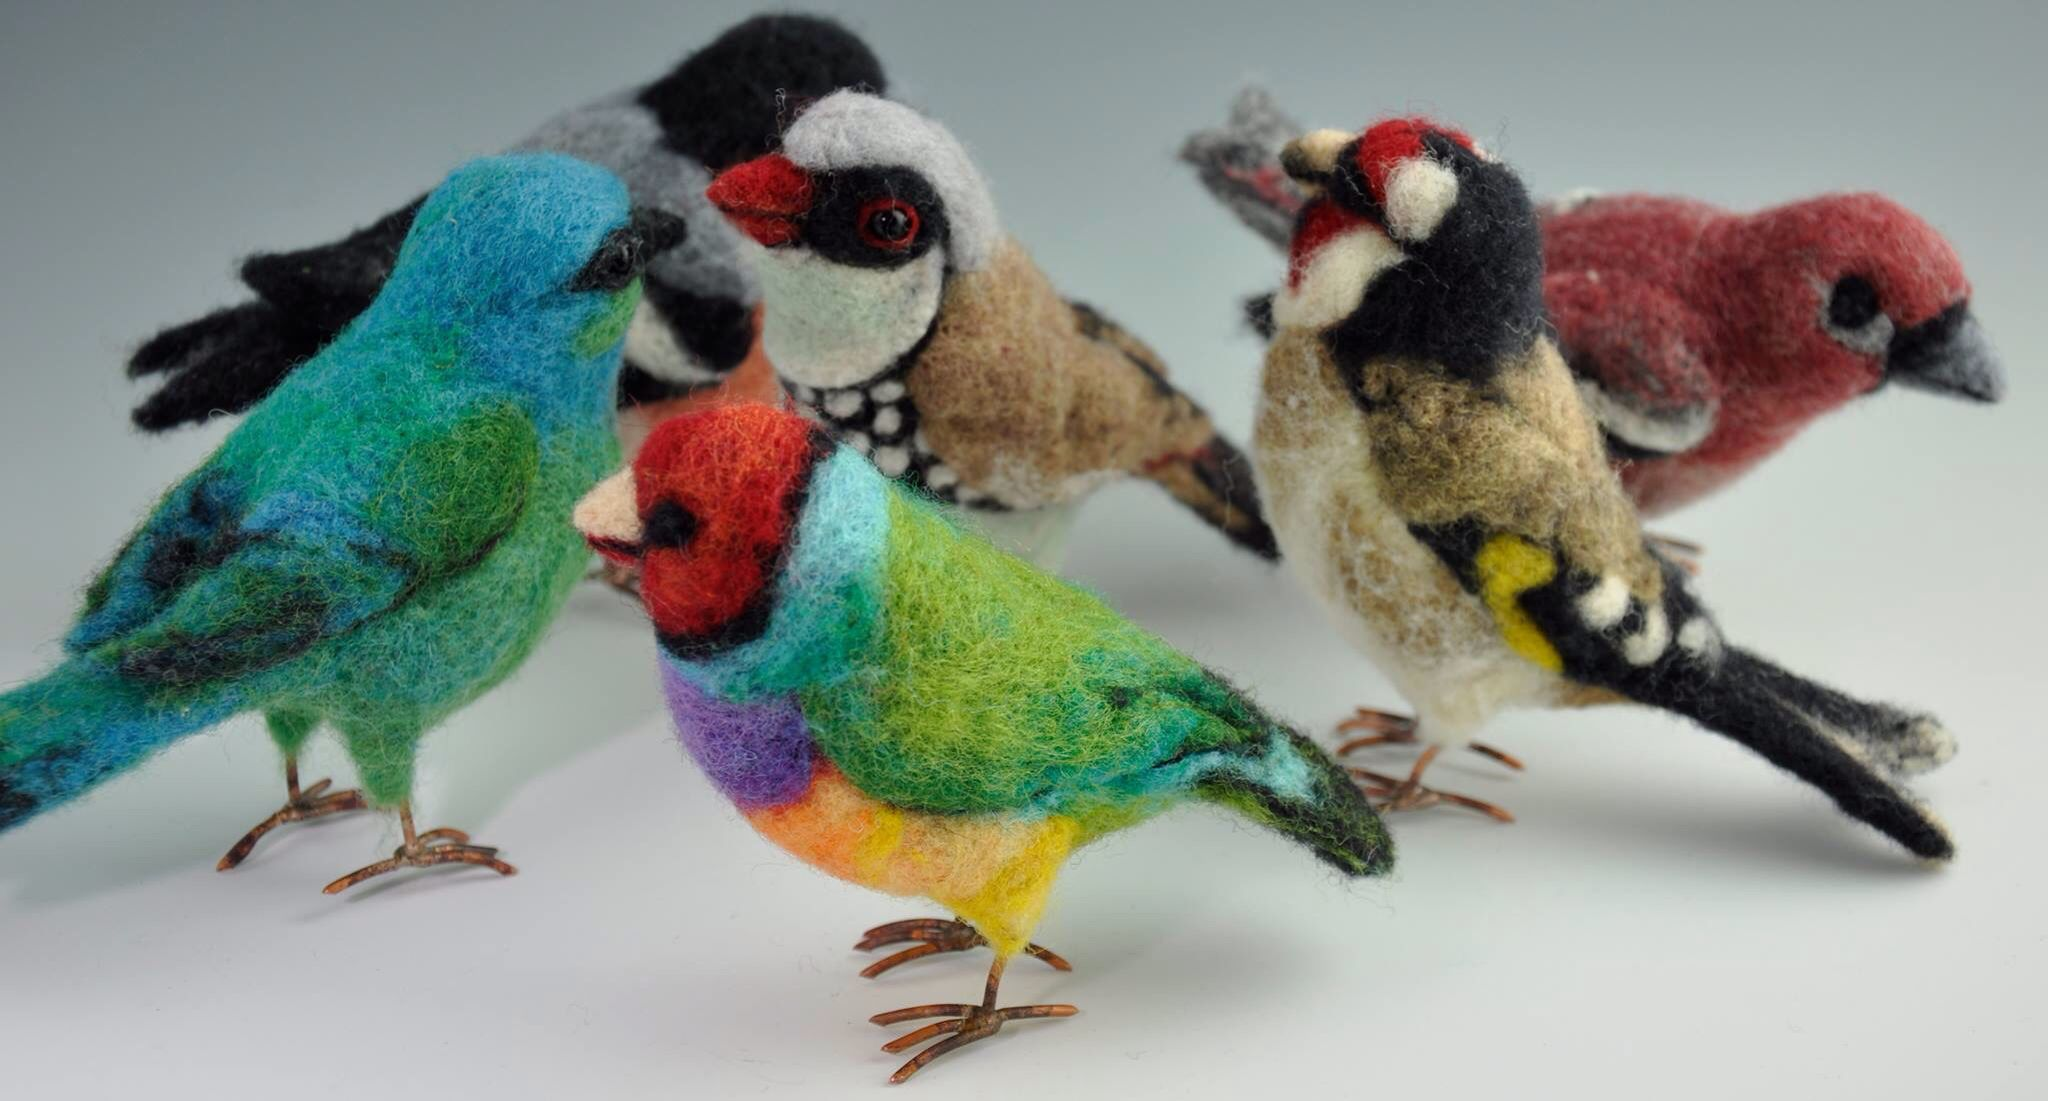 Needle felted finches by Jennifer Field Studios 2015